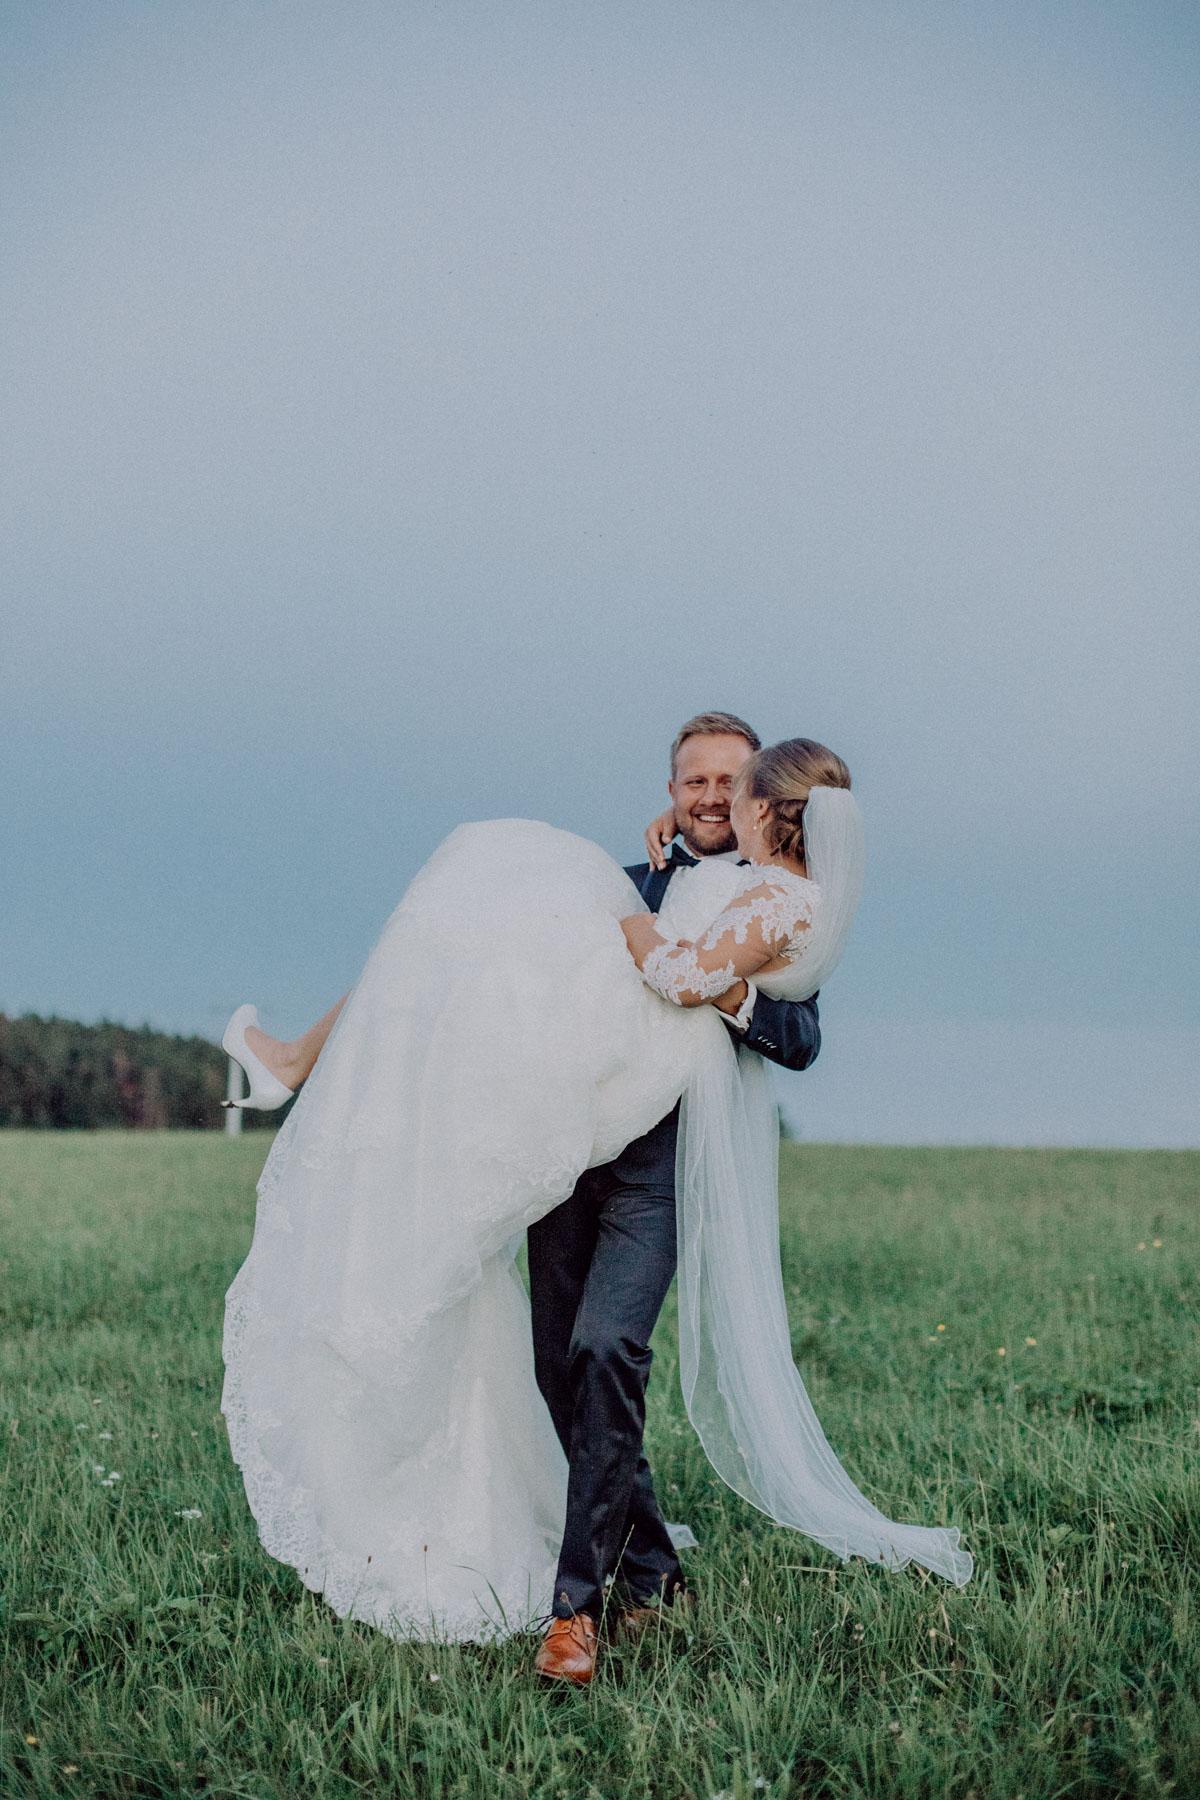 Brautshooting Bräutigam trägt Braut Hochzeitsfotograf